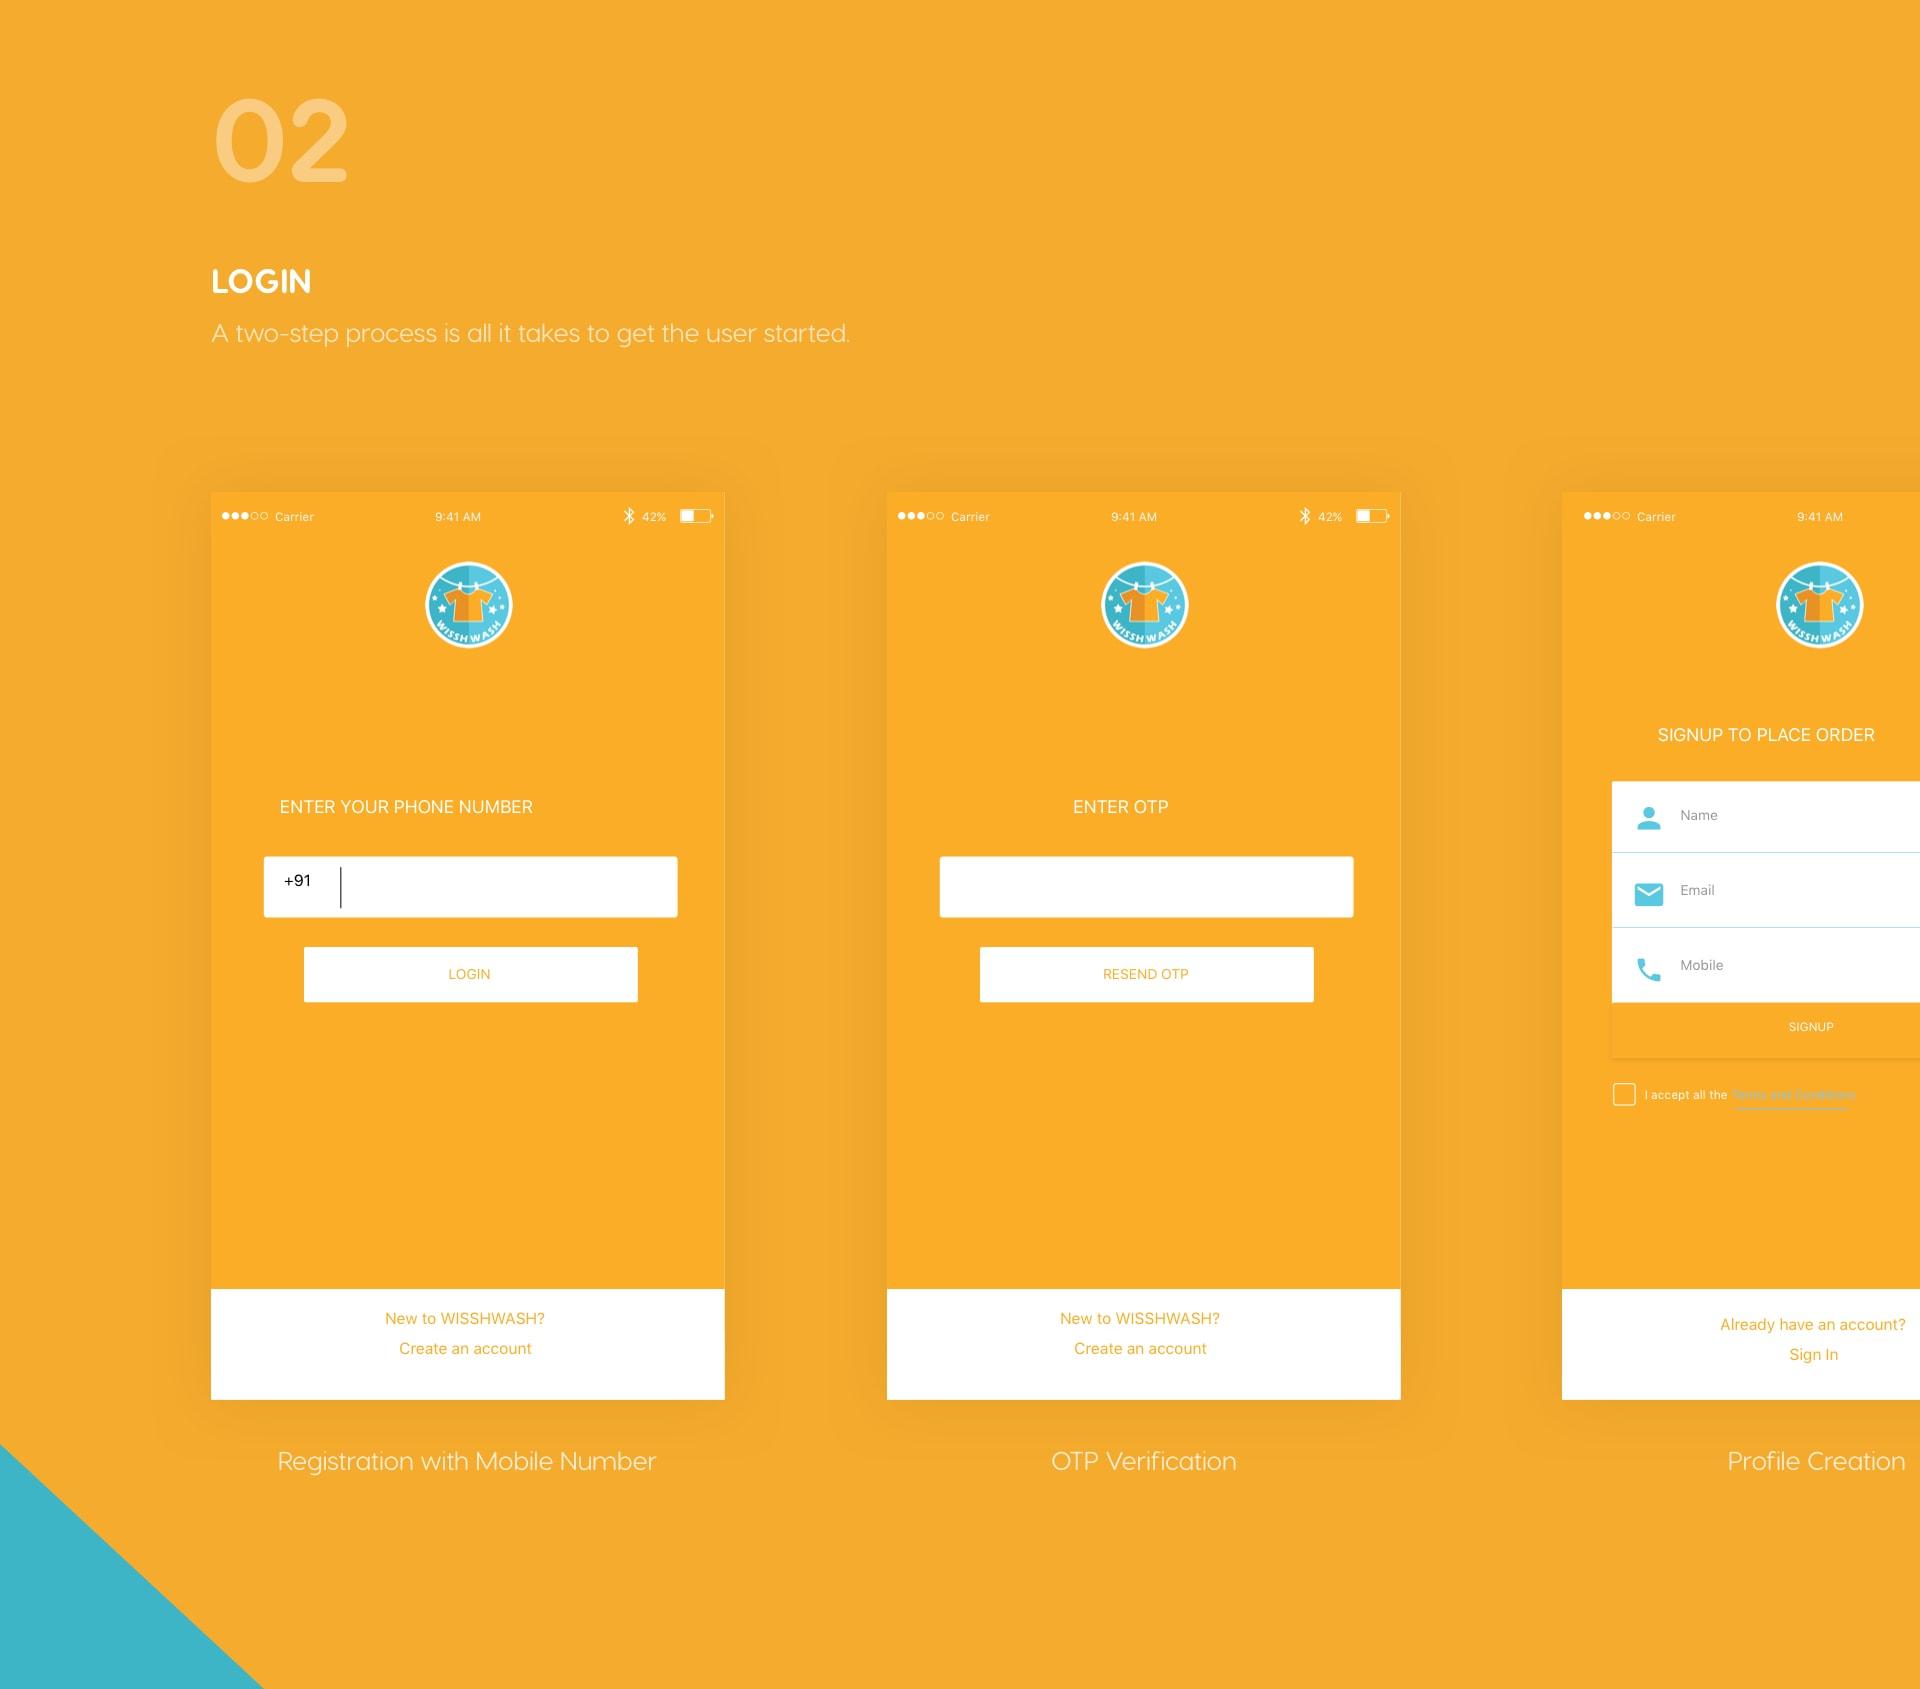 Login -a two-step process to login